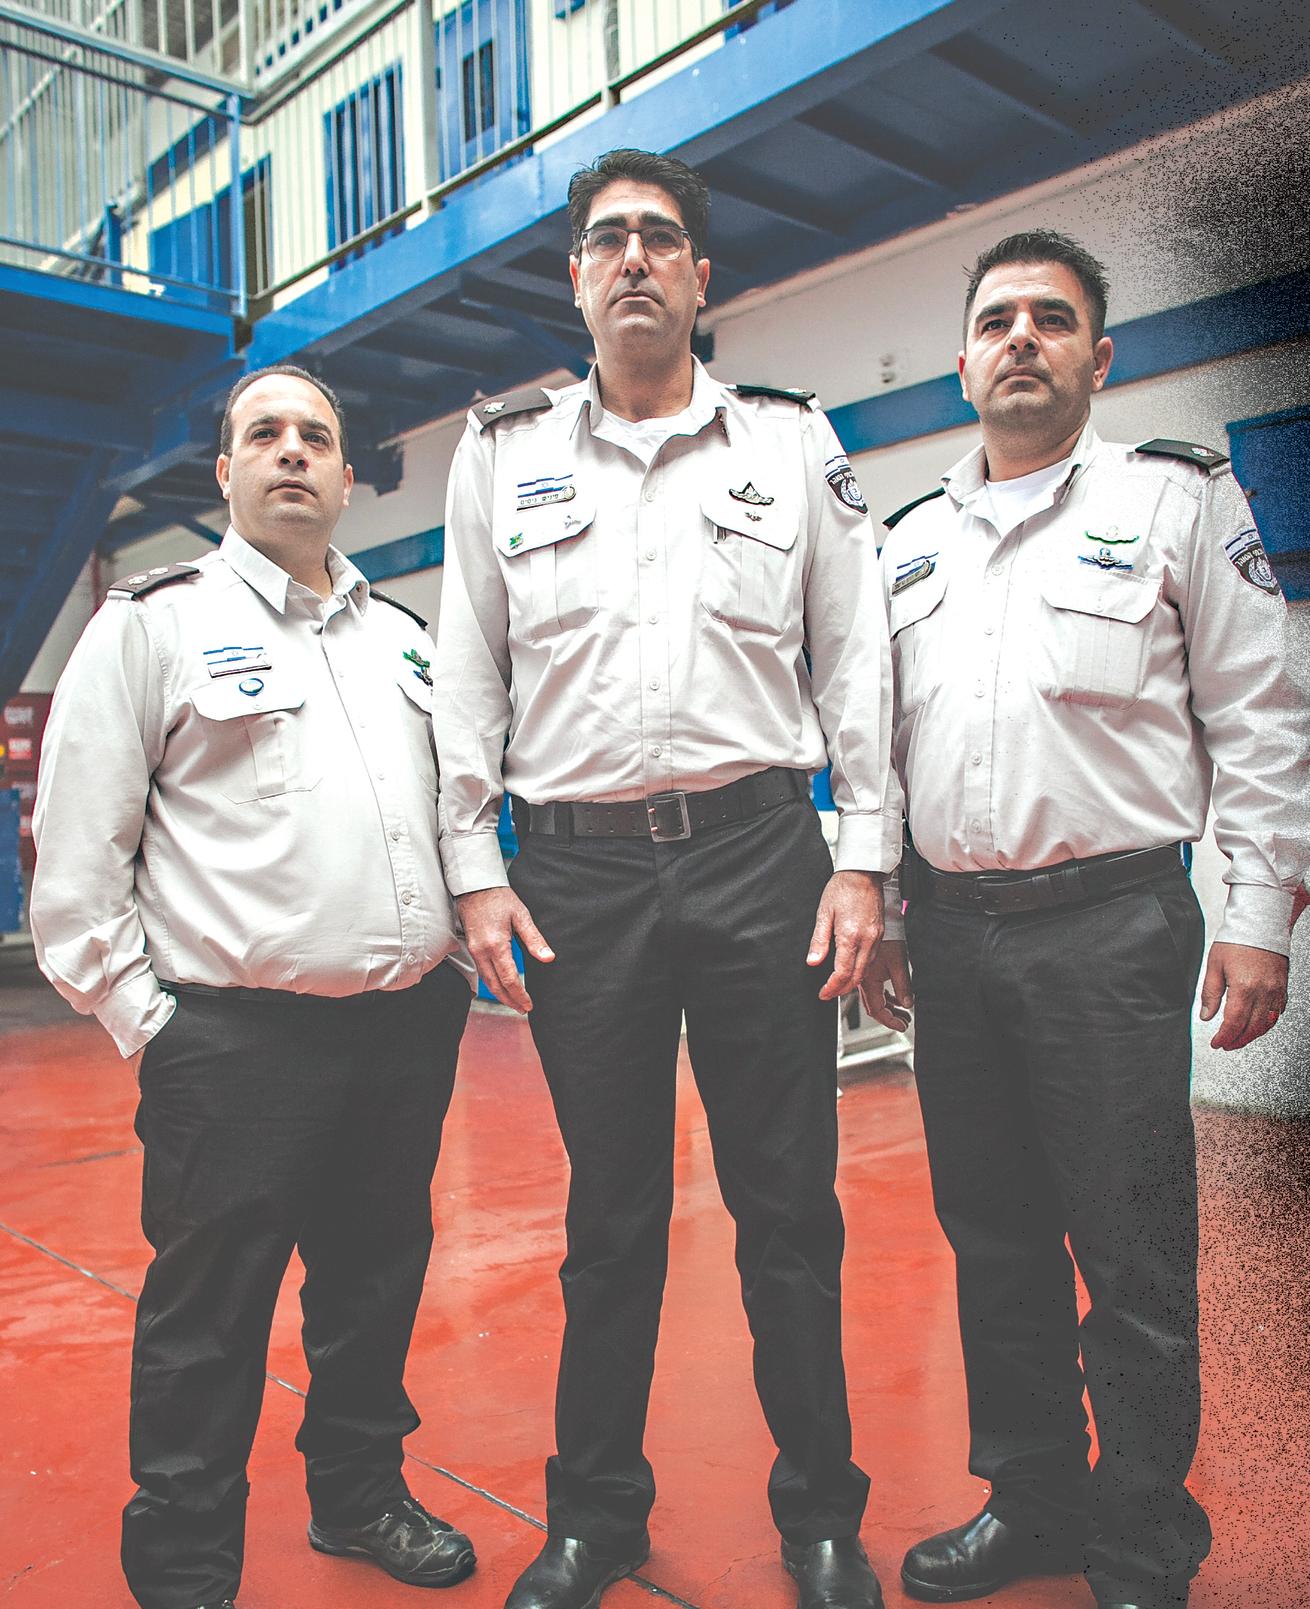 From right: Chief Superintendent Yossi Krispel, Chief Superintendent Nissim Finish and Deputy Commissioner Dudu Vaknin (Photo: Ilan Shapira)